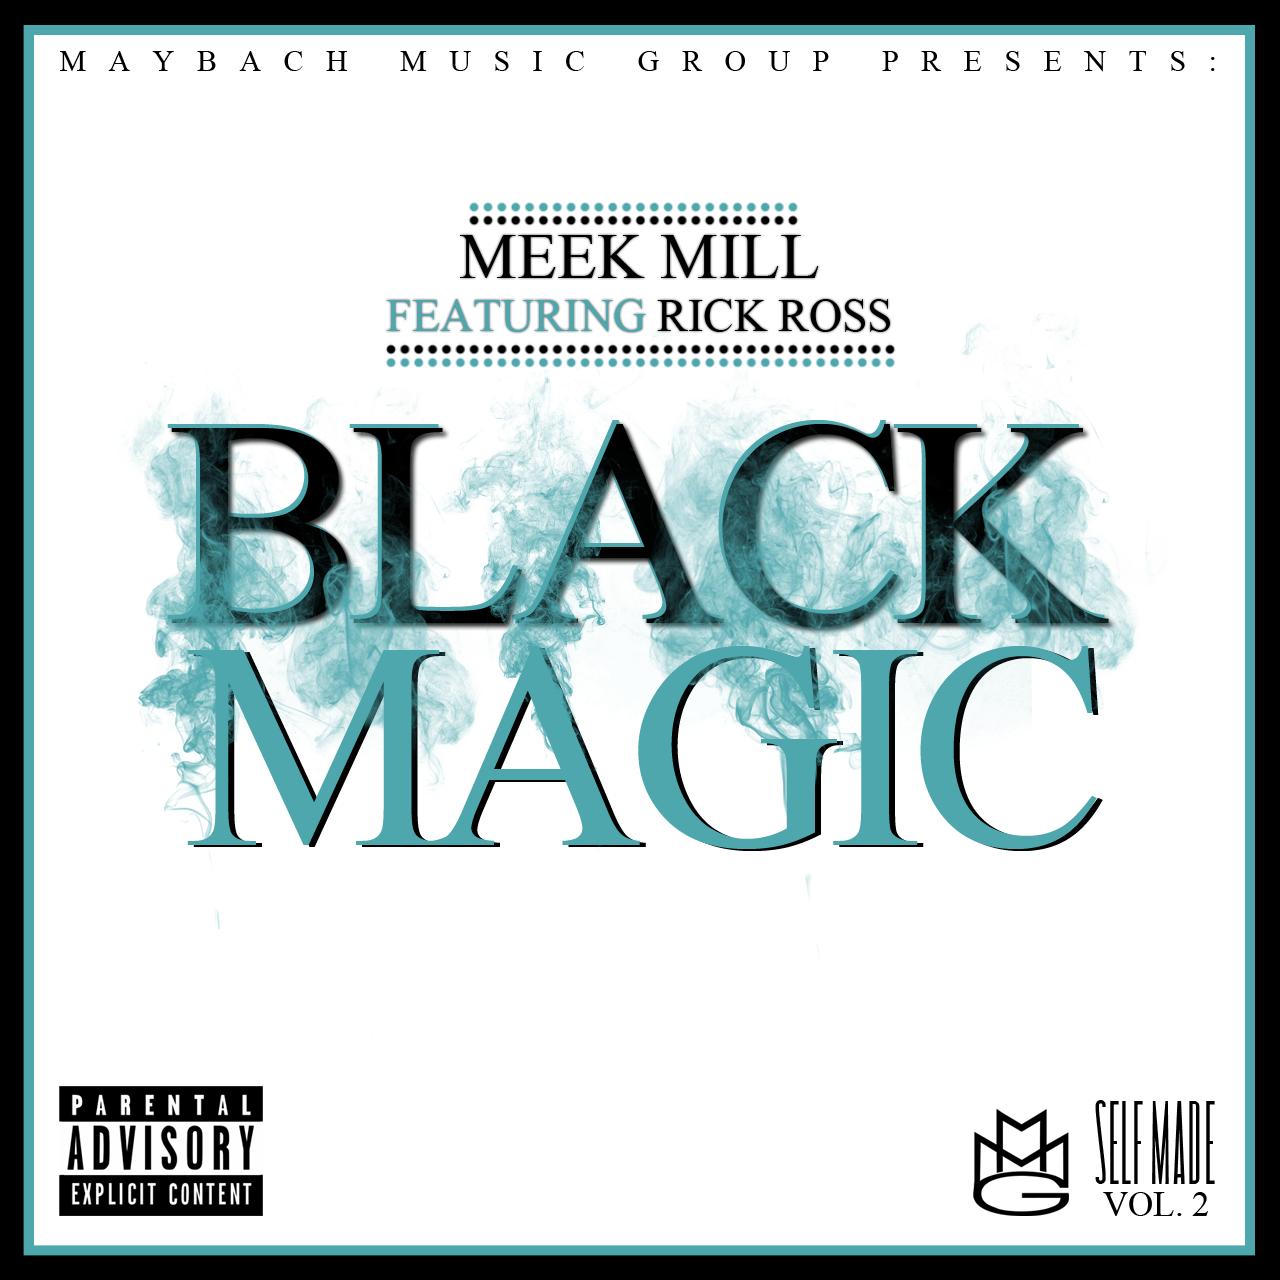 Lirik Lagu Black Magic Lyrics - Meek Mill - Lirik Lagu Barat